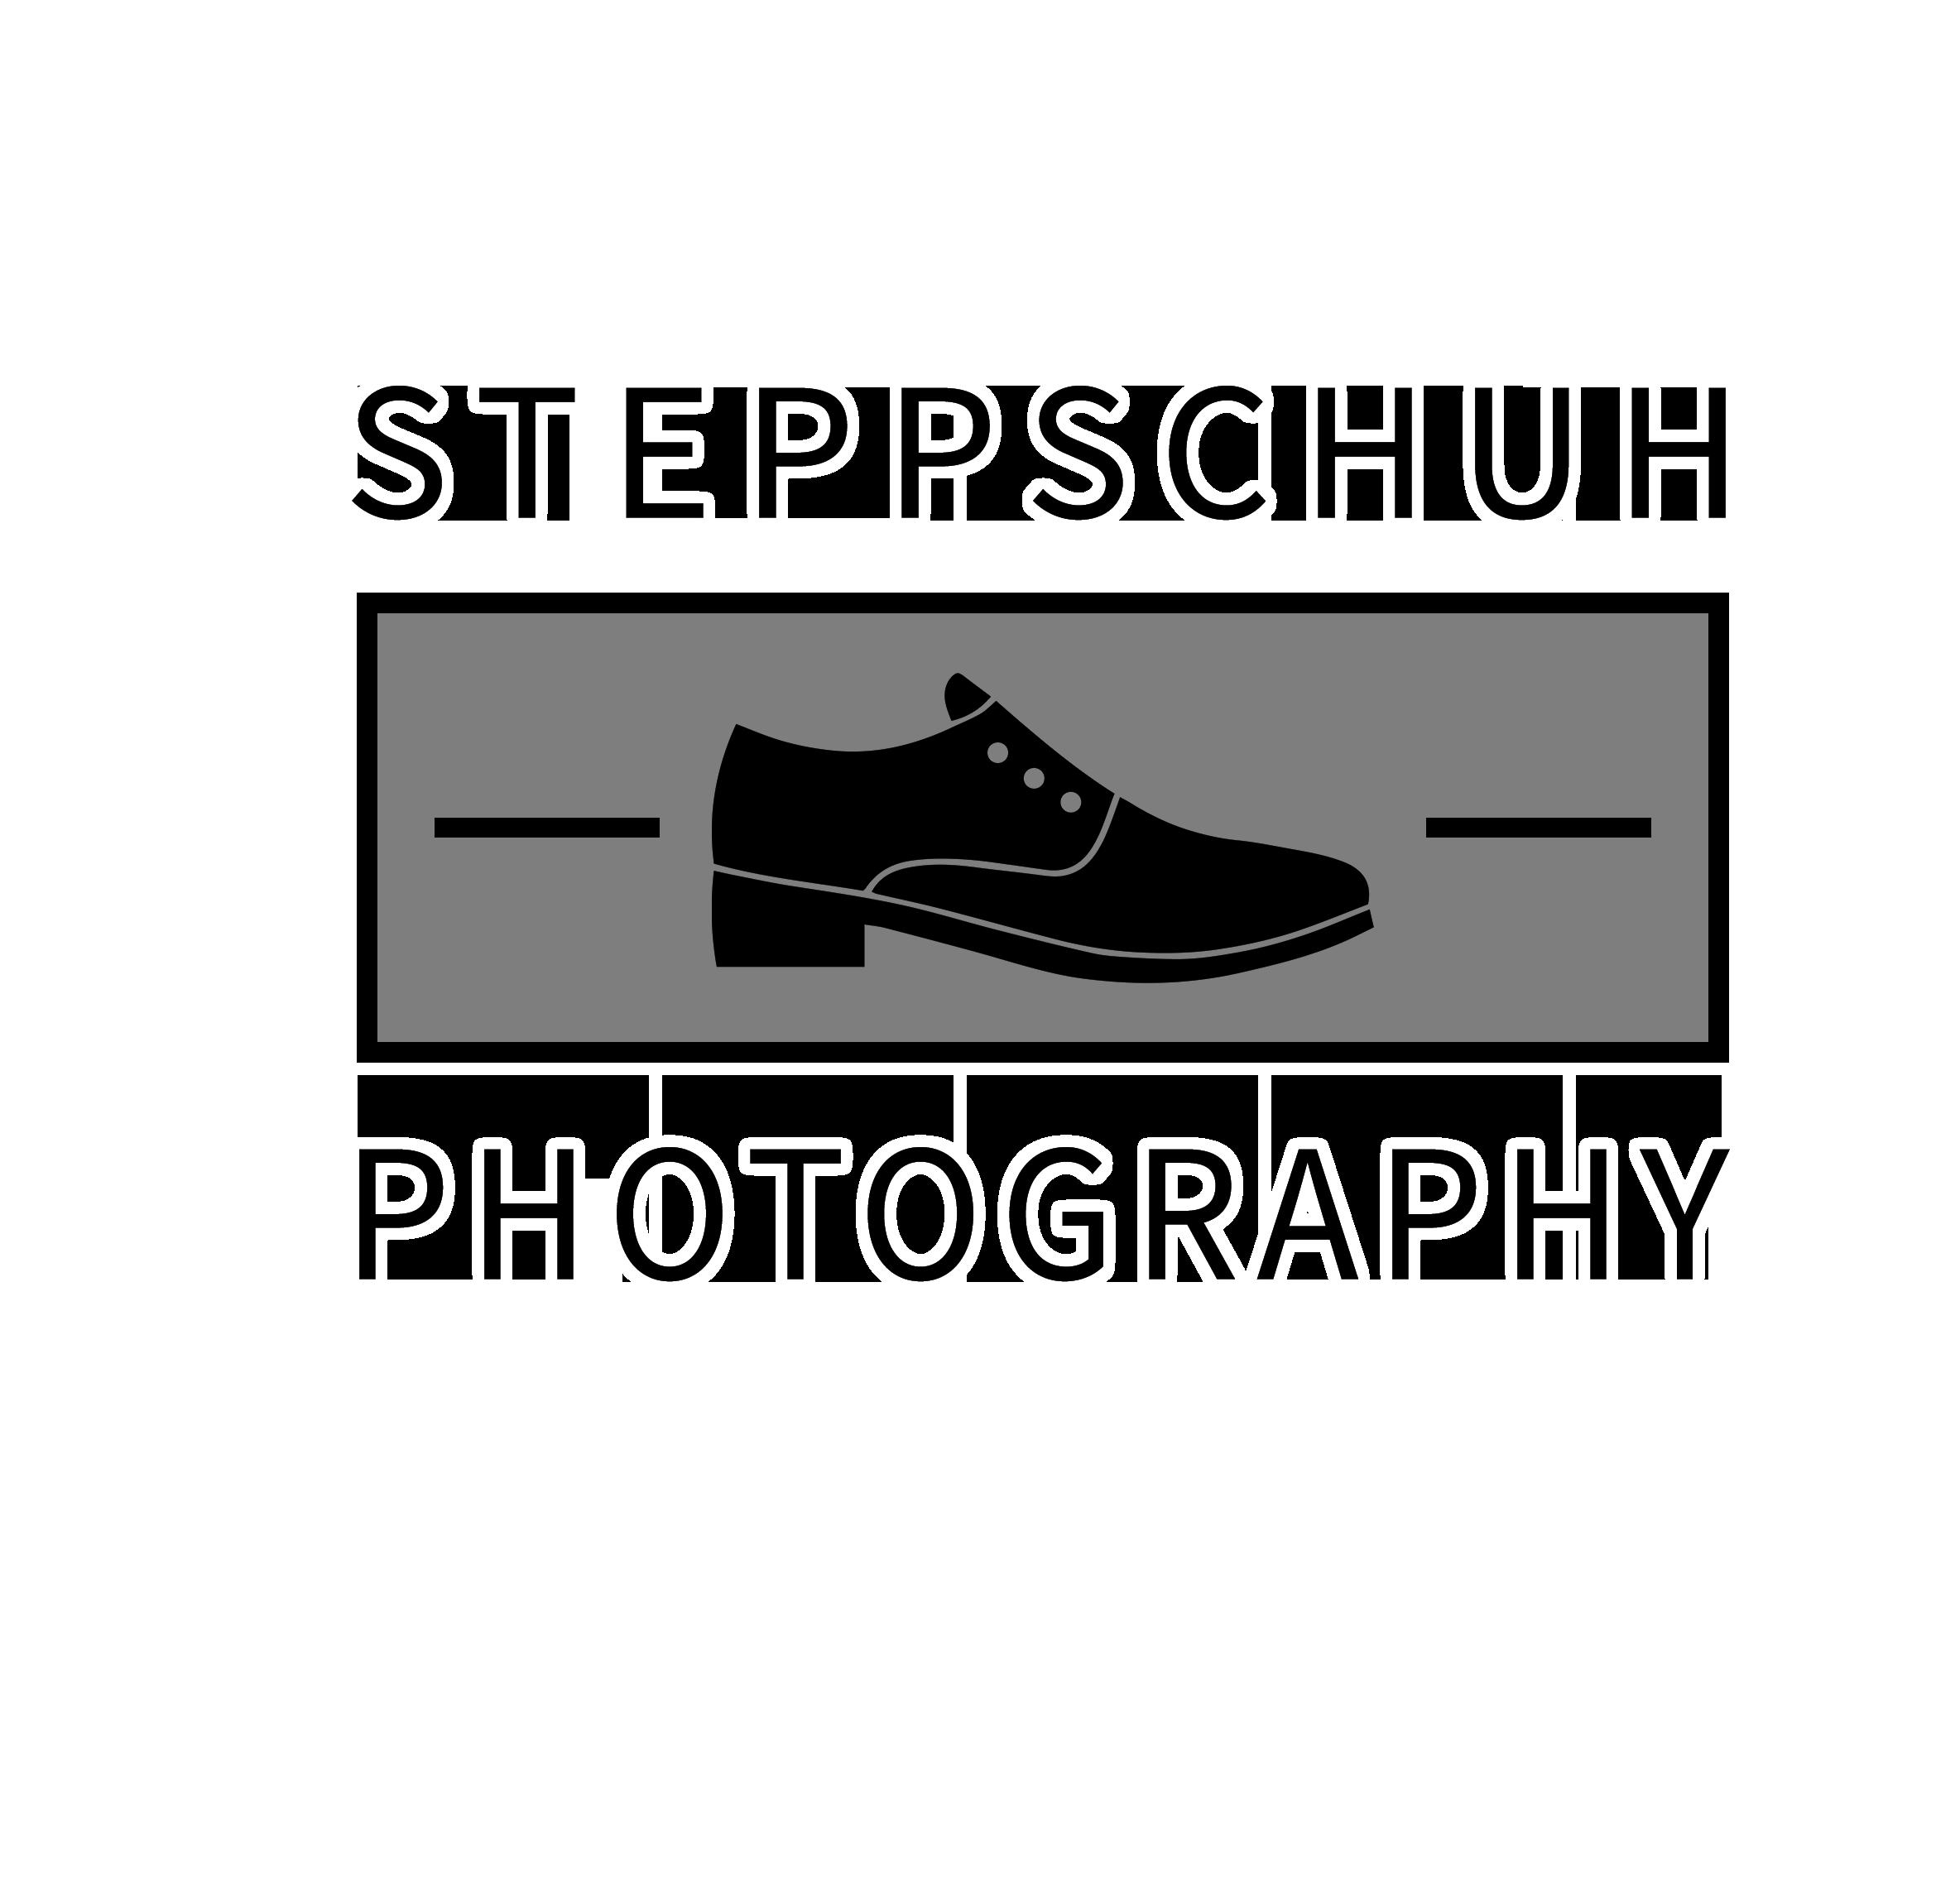 Stephan Schultz